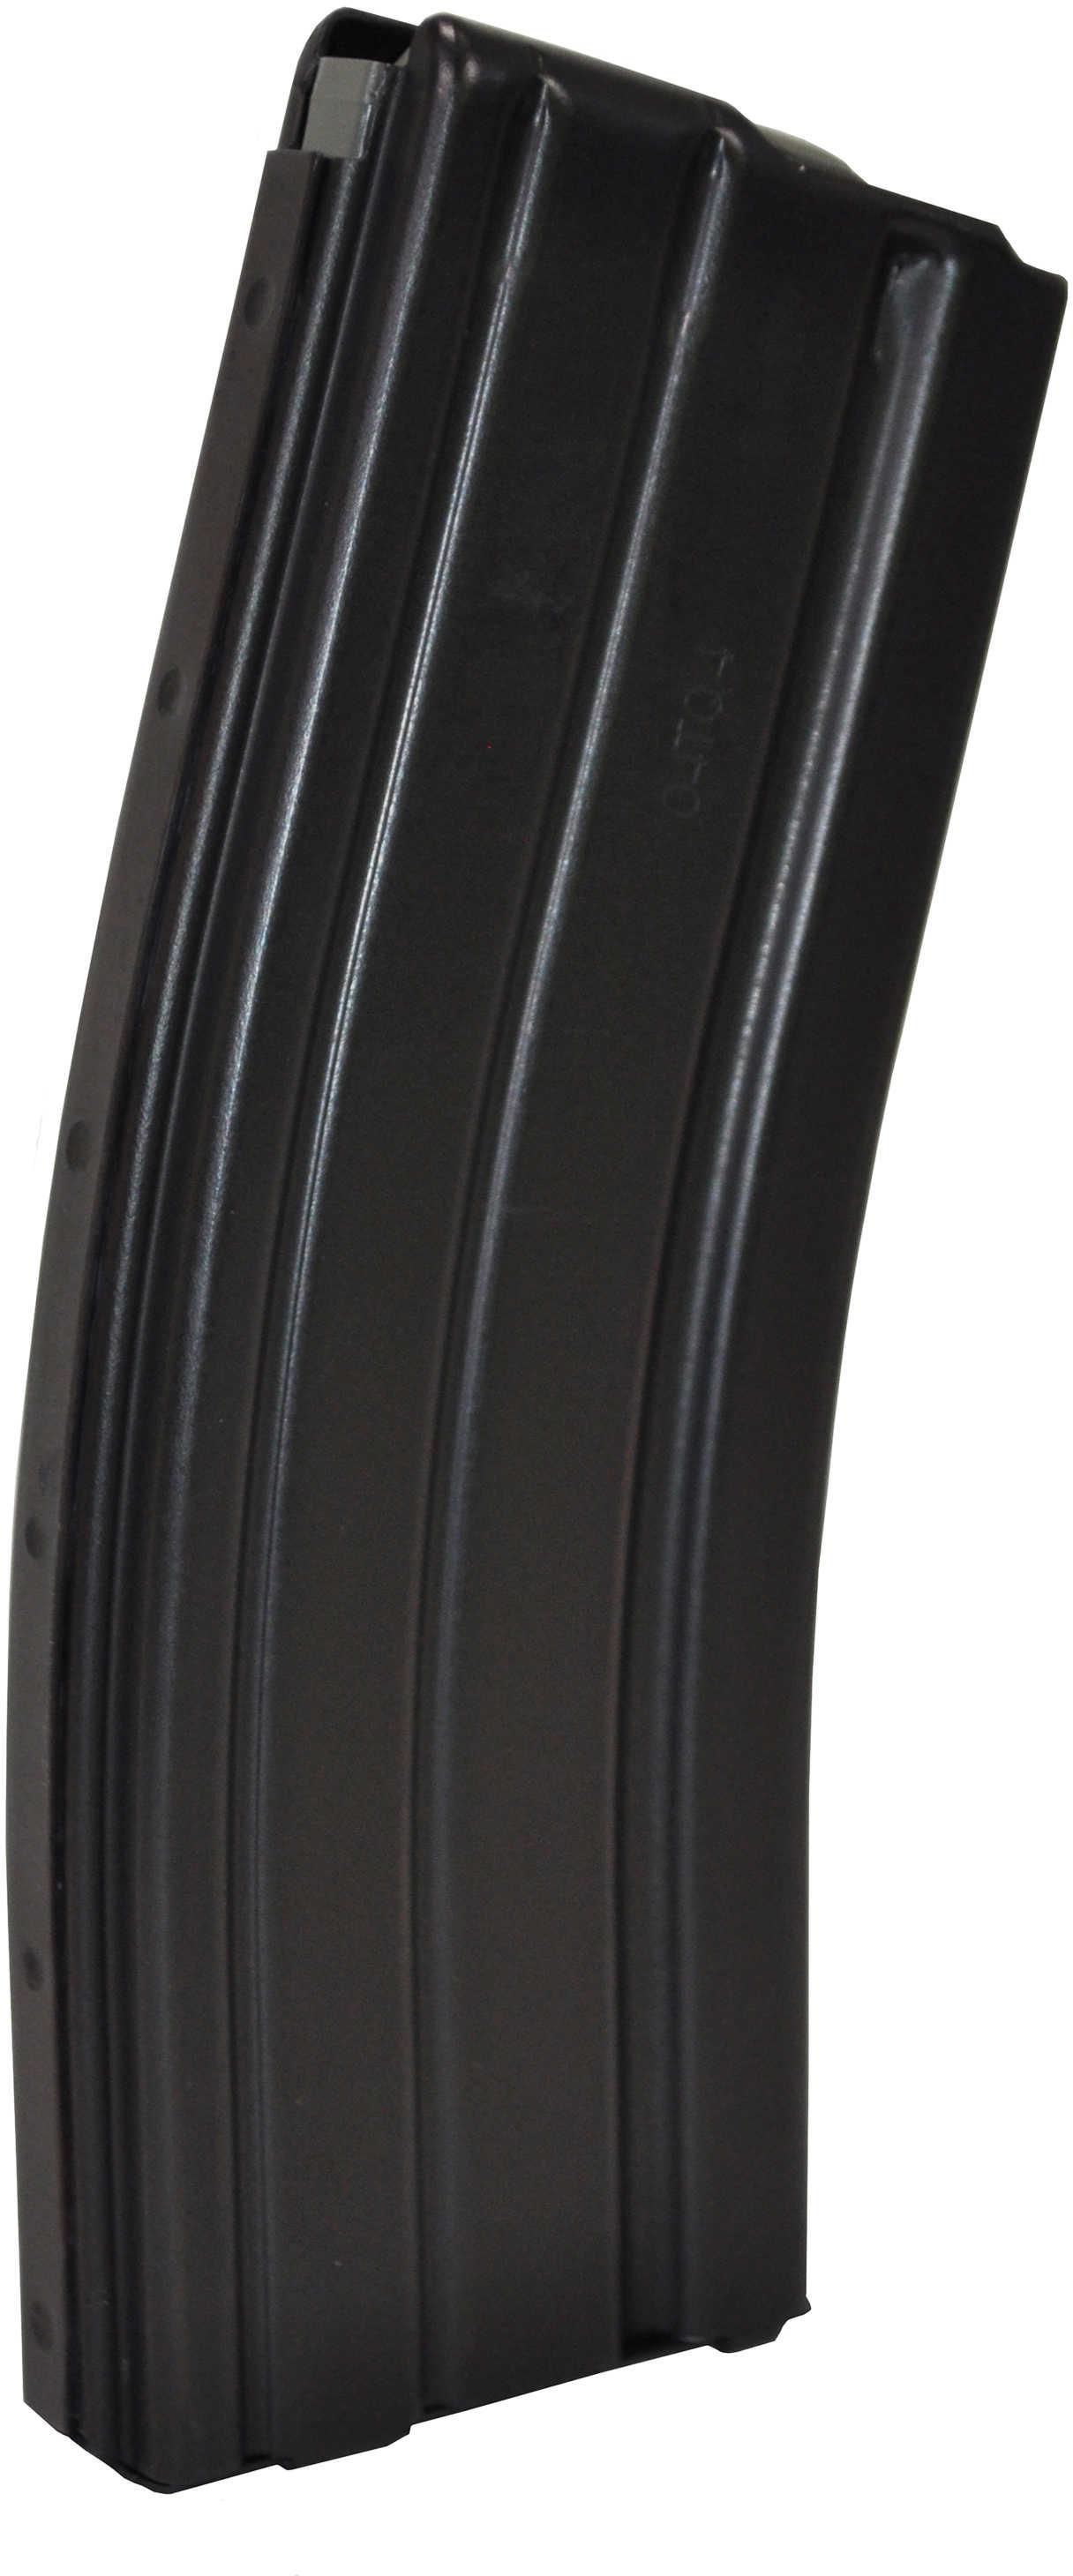 DPMS Magazine 30 Rounds A15 AR15 M16 Black Teflon MA-02